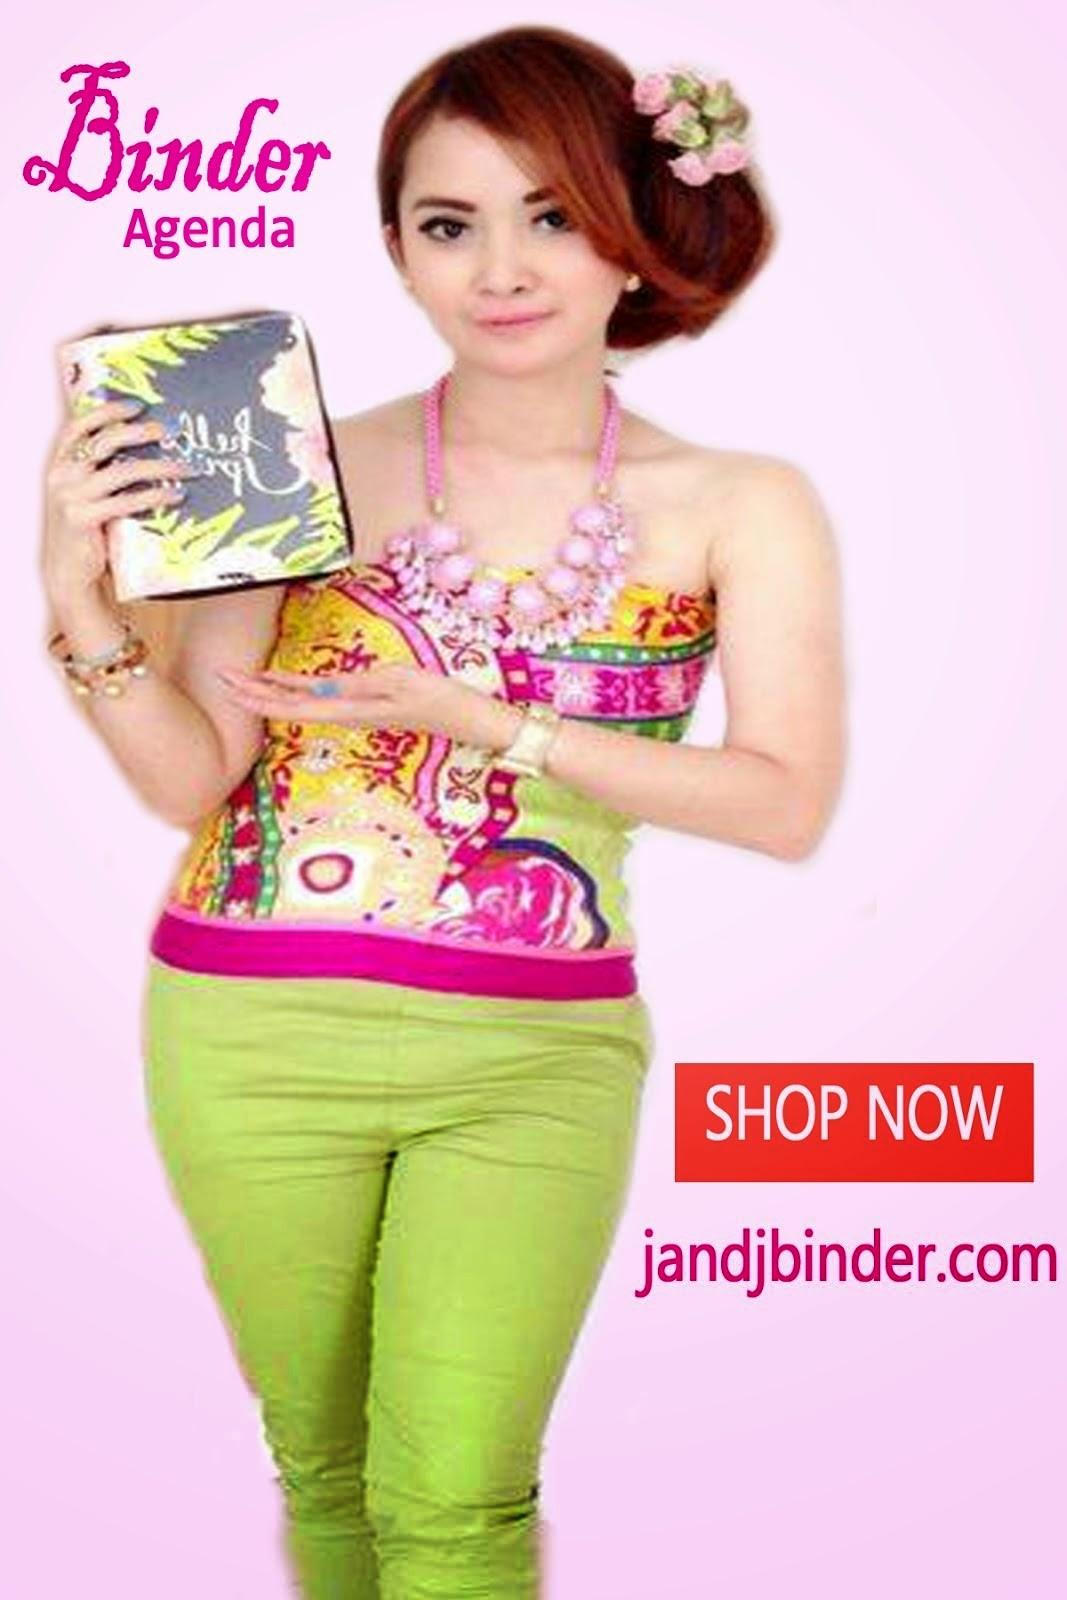 http://www.jandjbinder.com/search/label/Binder%20Agenda%20HPO